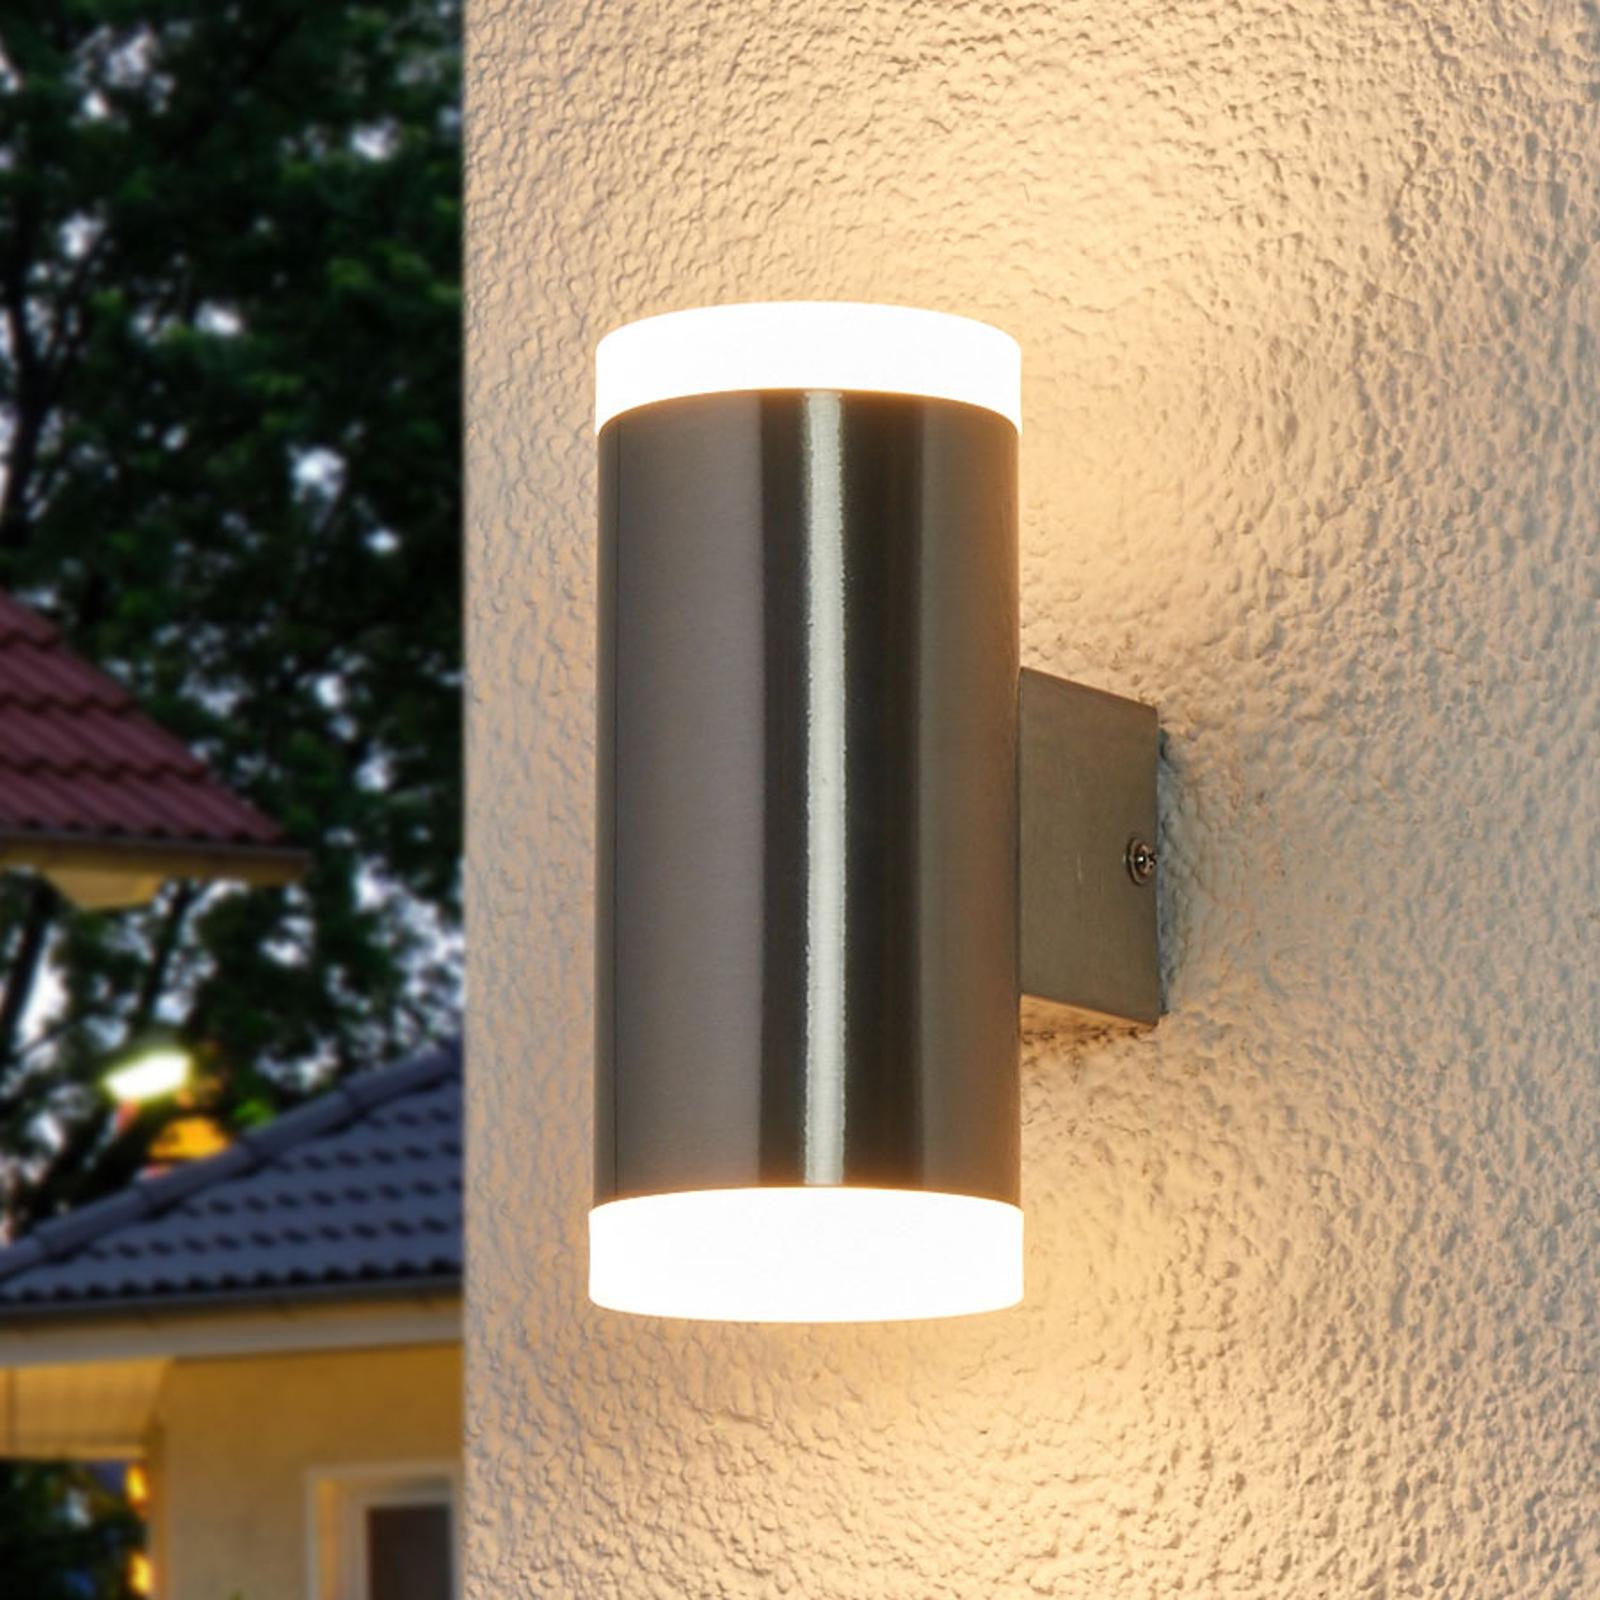 LED-utevegglampe Eliano, rustfritt stål, 2 lys.